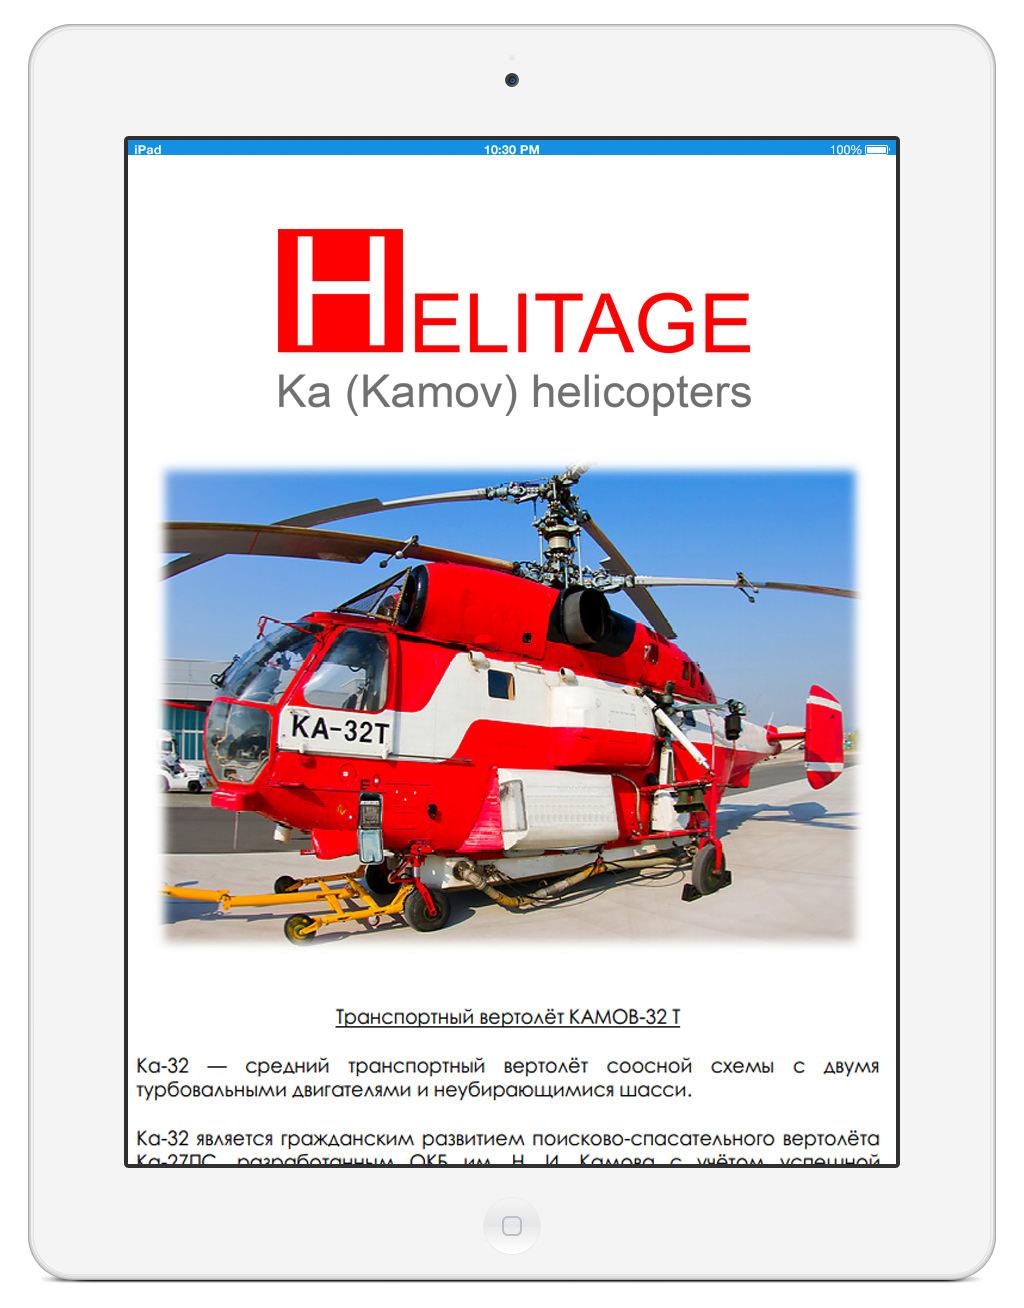 ka helicopters for sale